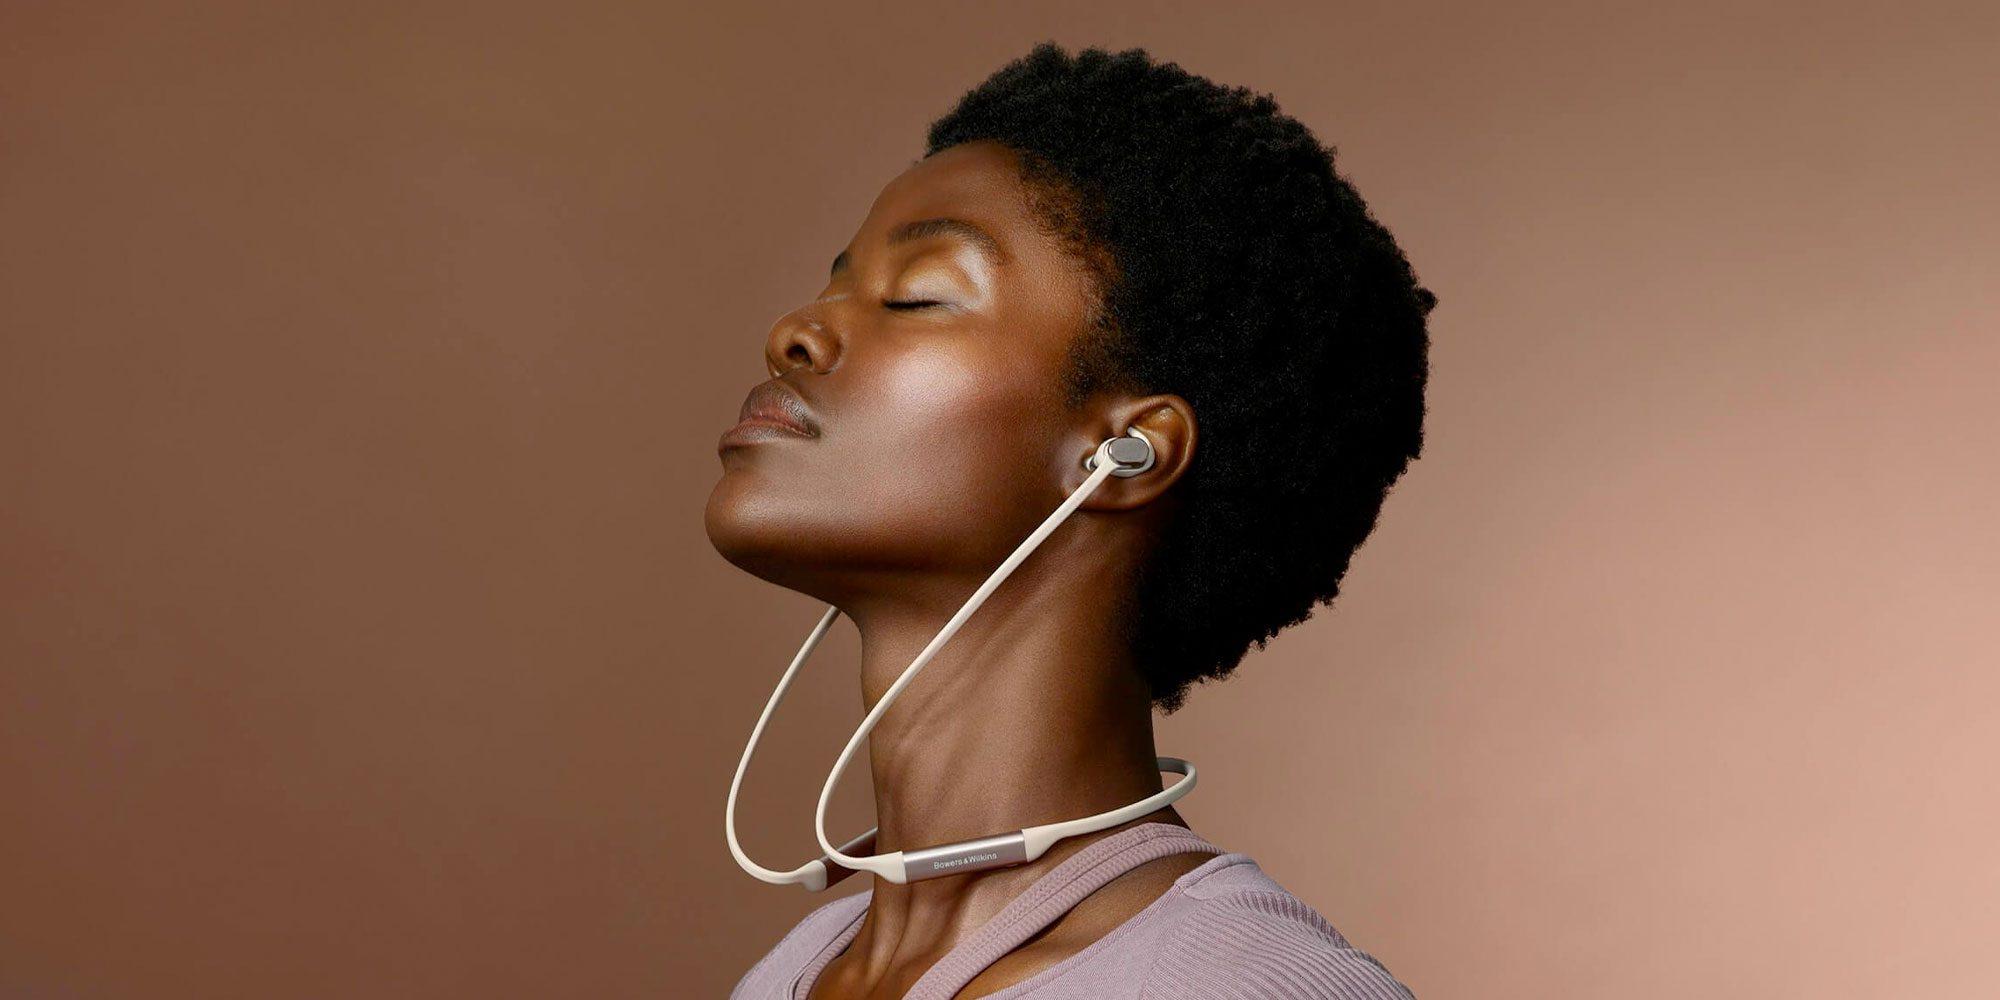 Bowers & Wilkins PI4 - Best Neckband Headphones